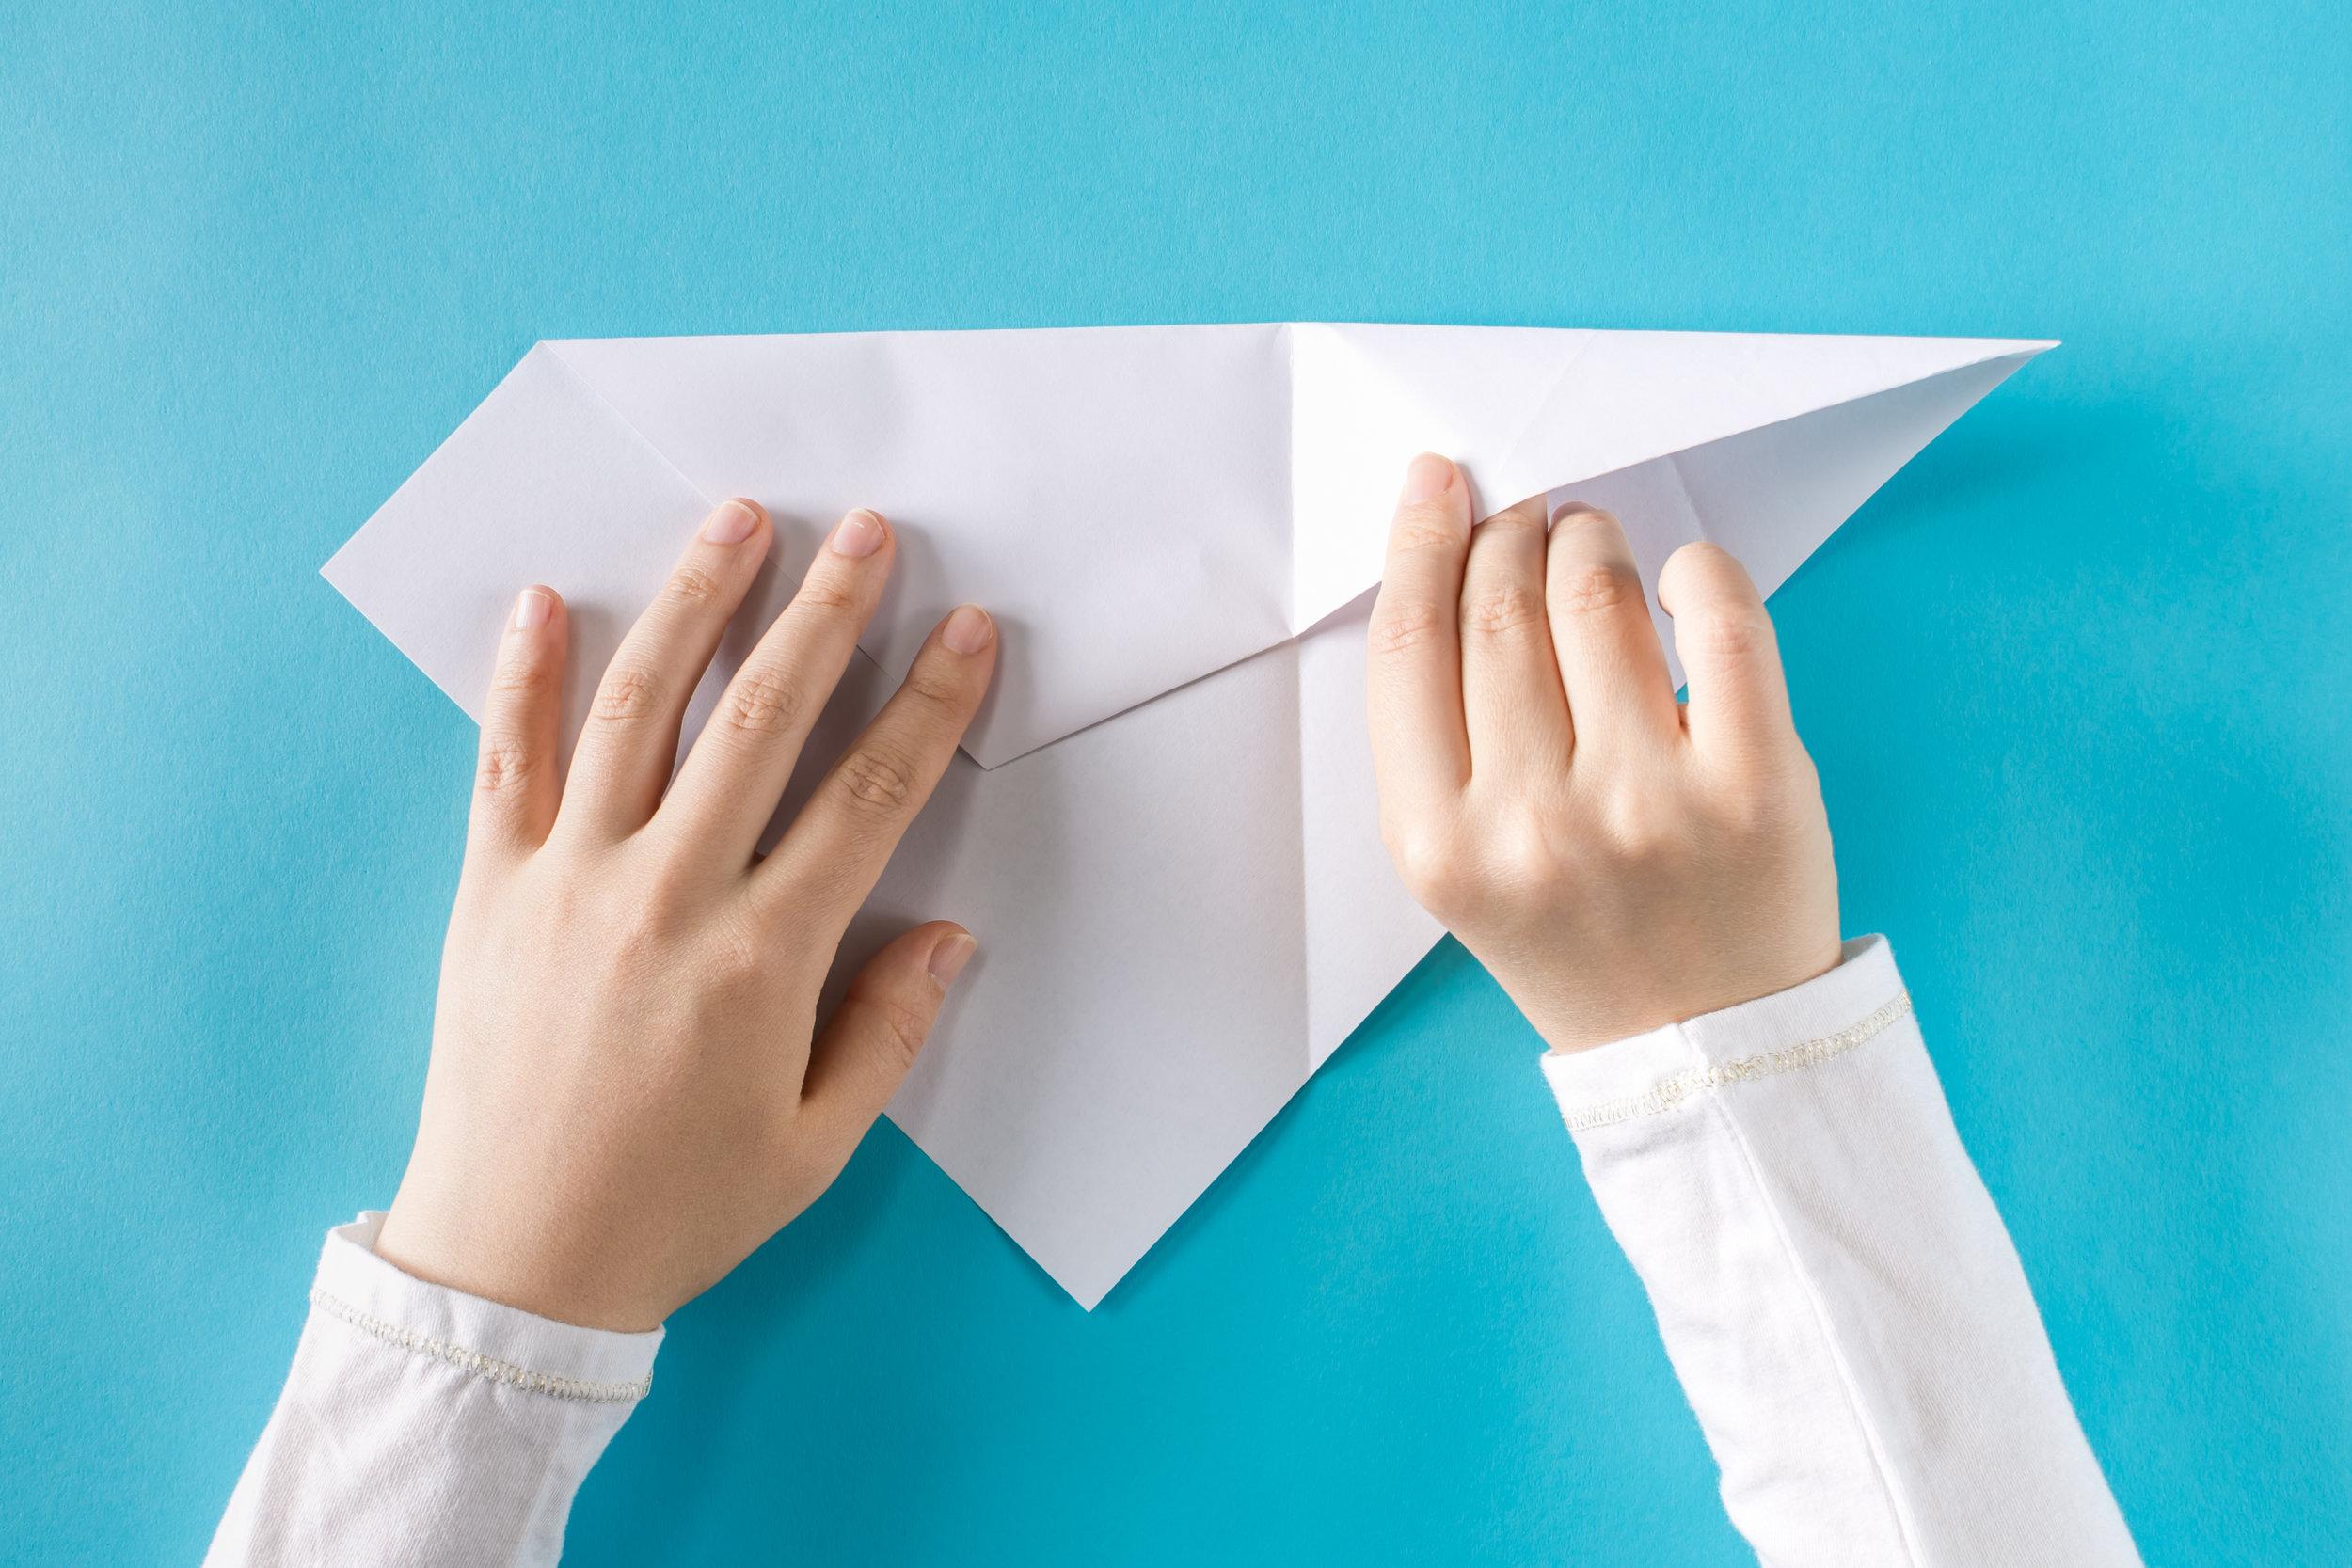 paper plane folding.jpeg